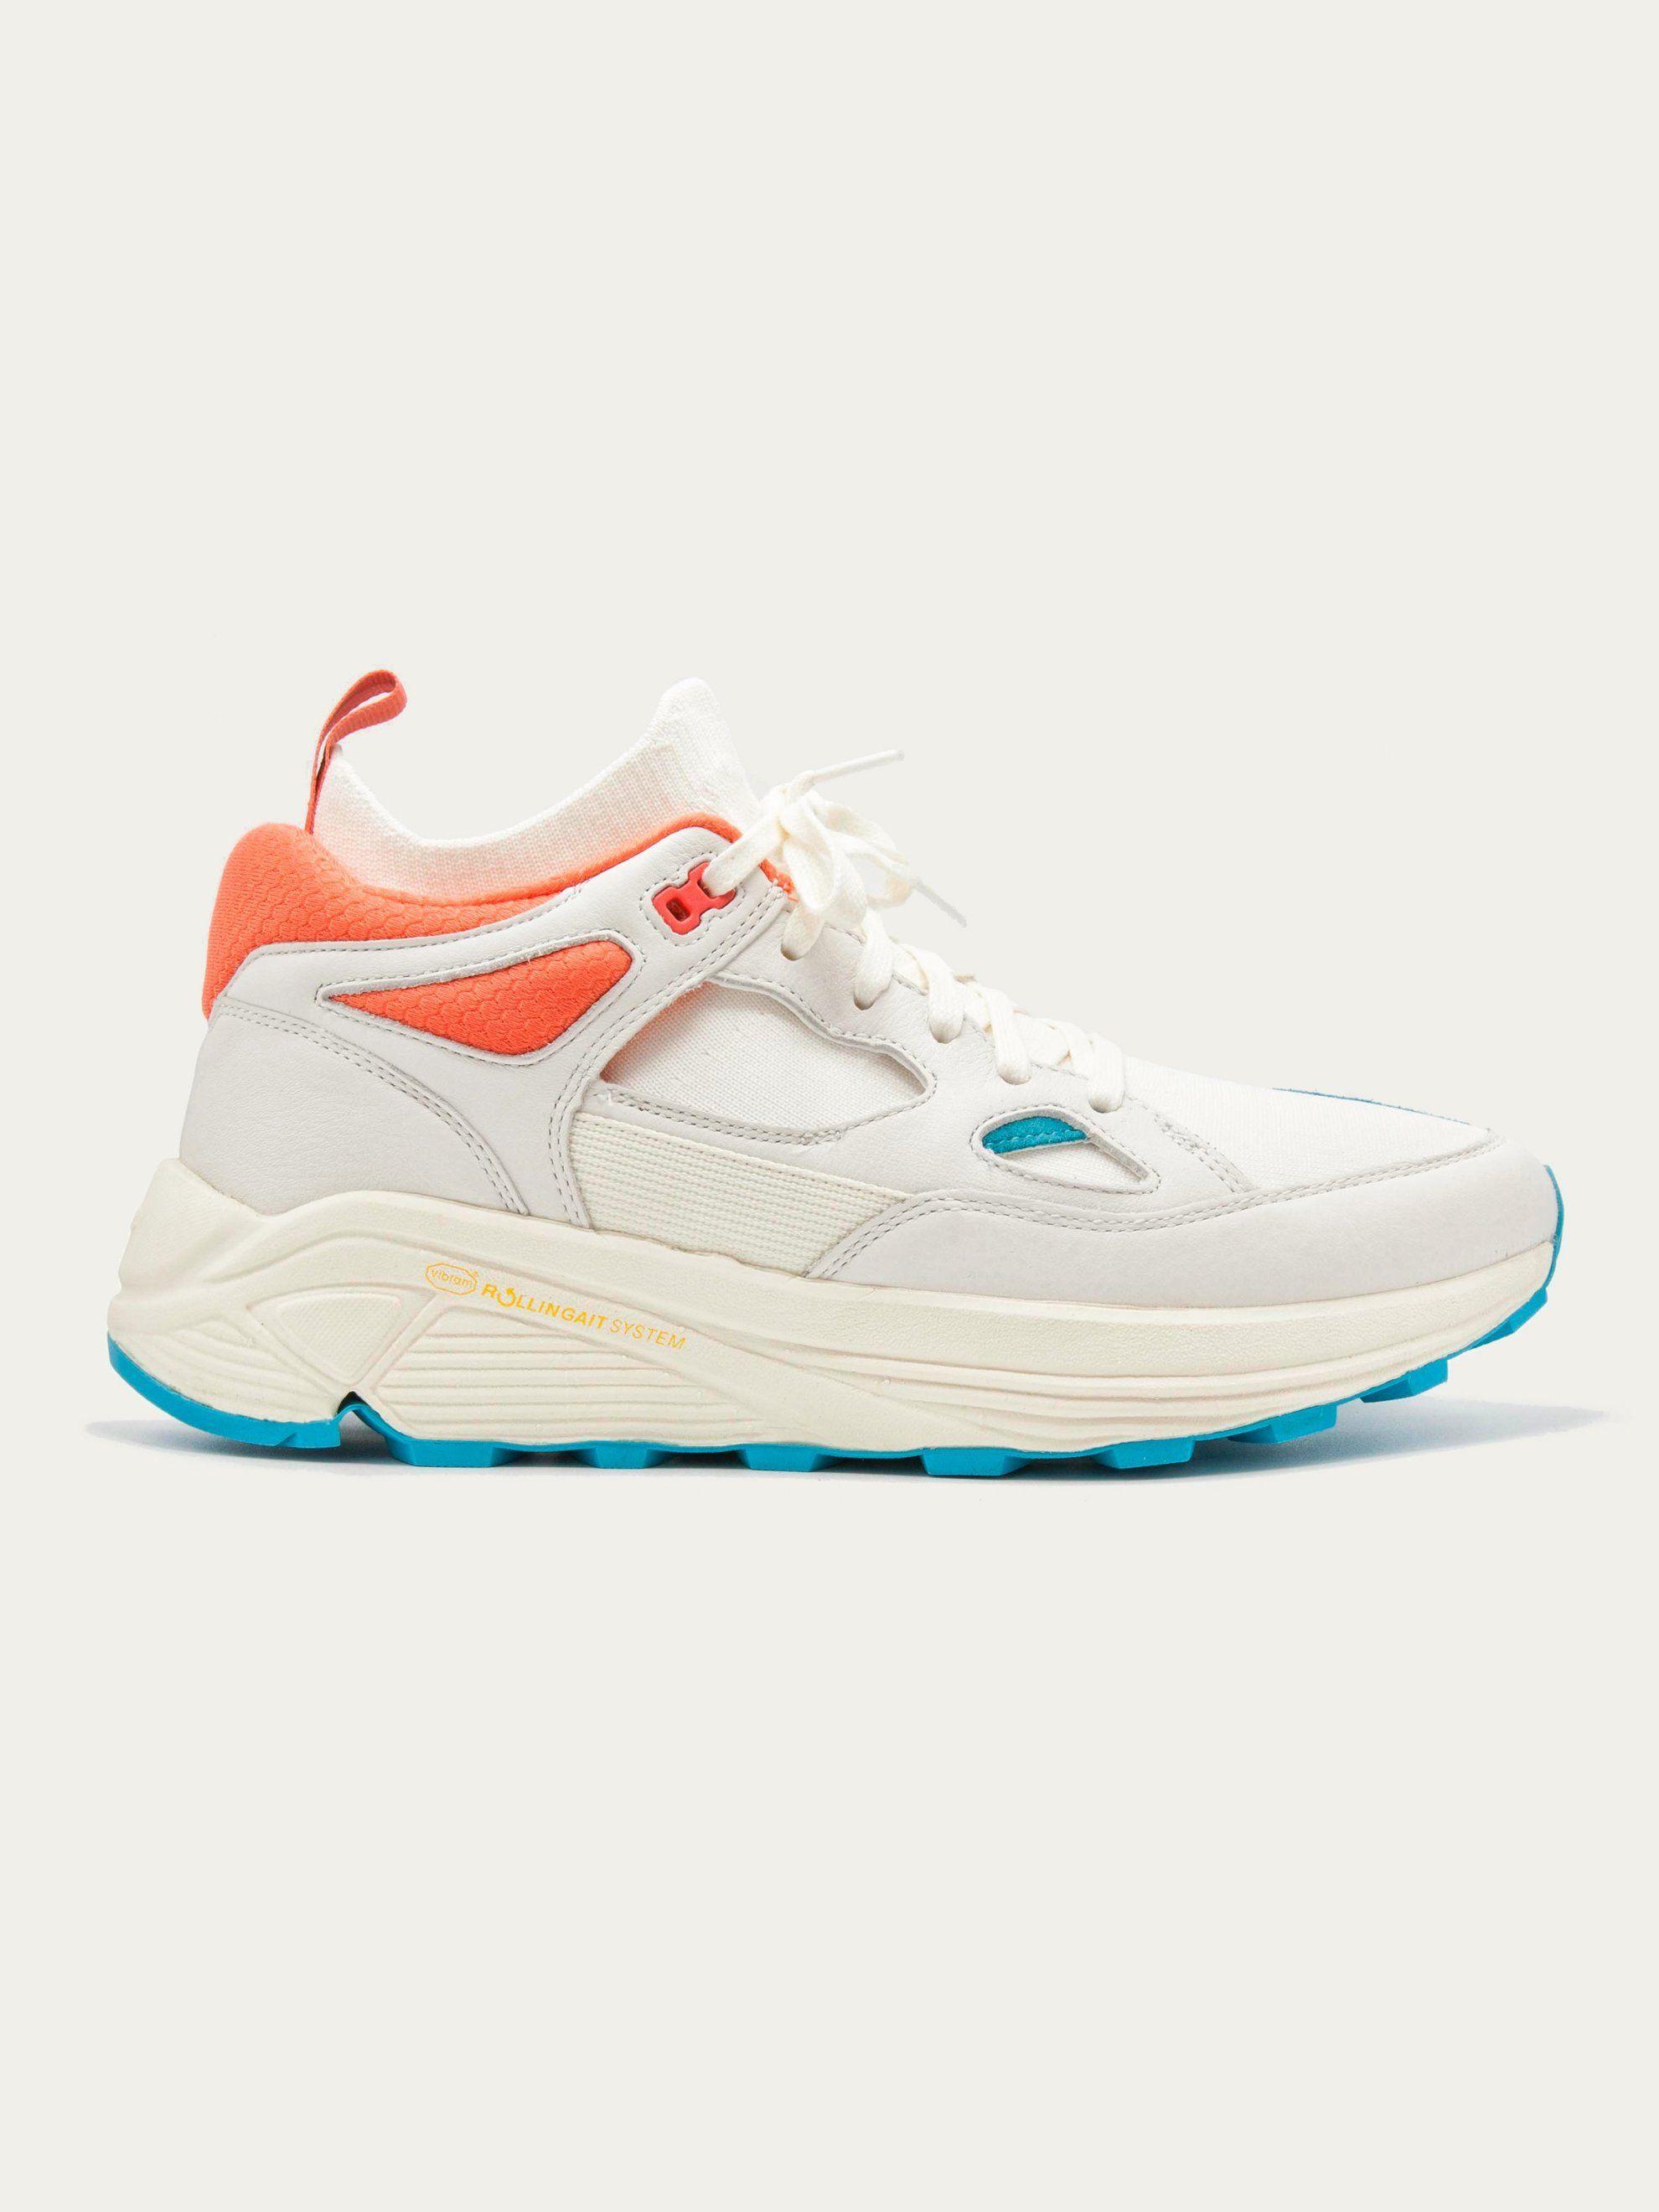 promo code 0024e b134b BRANDBLACK - Aura WhiteAqua Sneakers - 200.00